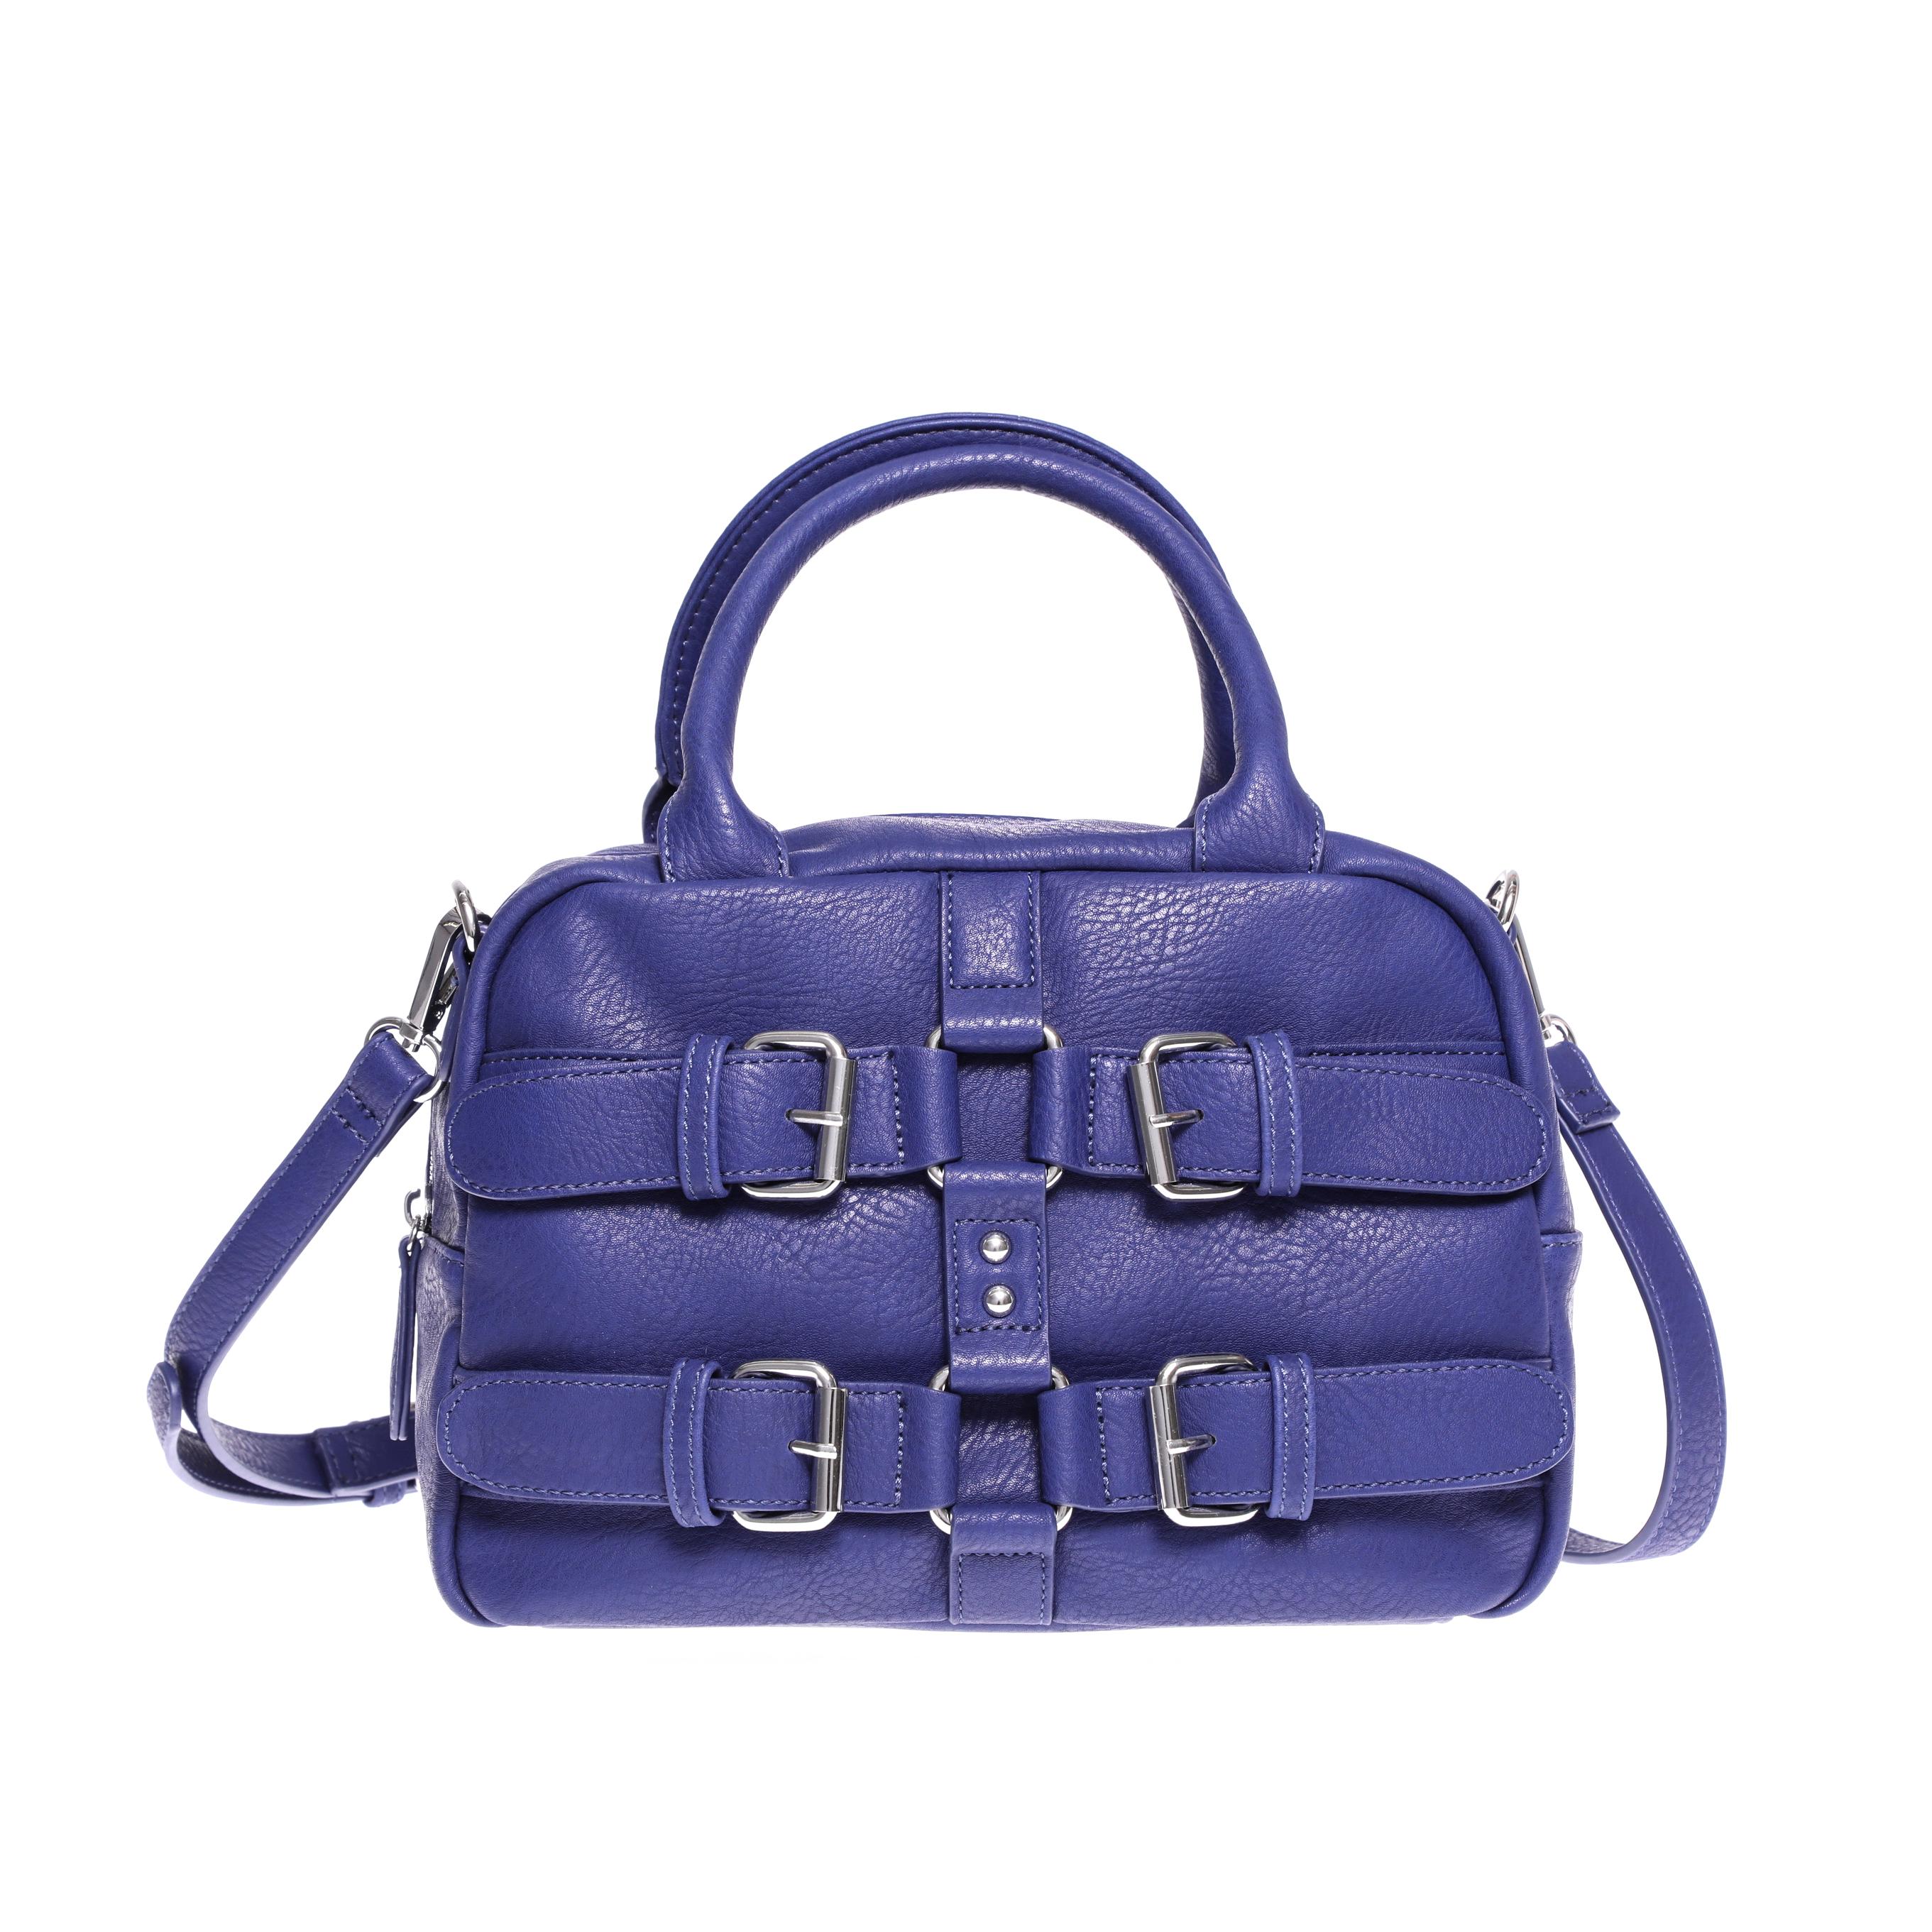 DENNY ROSE - Γυναικεία τσάντα Denny Rose μπλε-μωβ γυναικεία αξεσουάρ τσάντες σακίδια χειρός